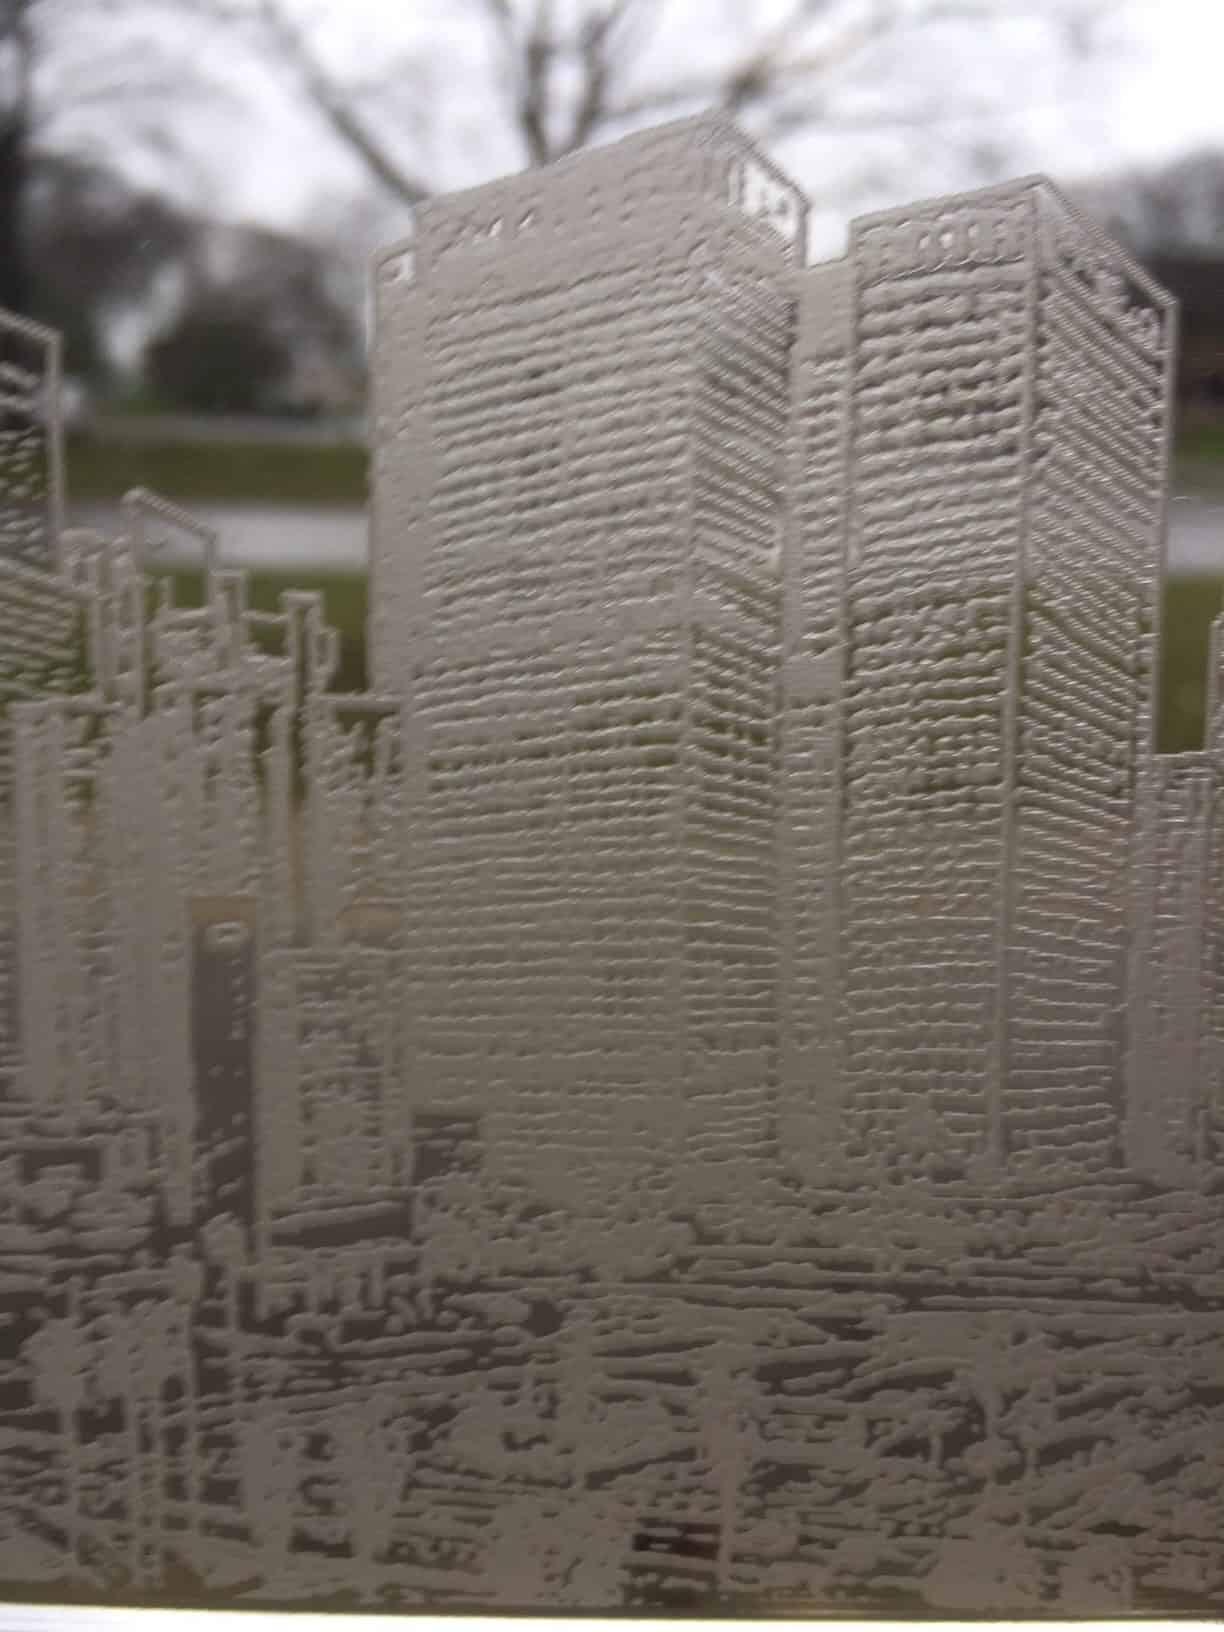 Laser Engraved L.A. Skyline on Acrylic